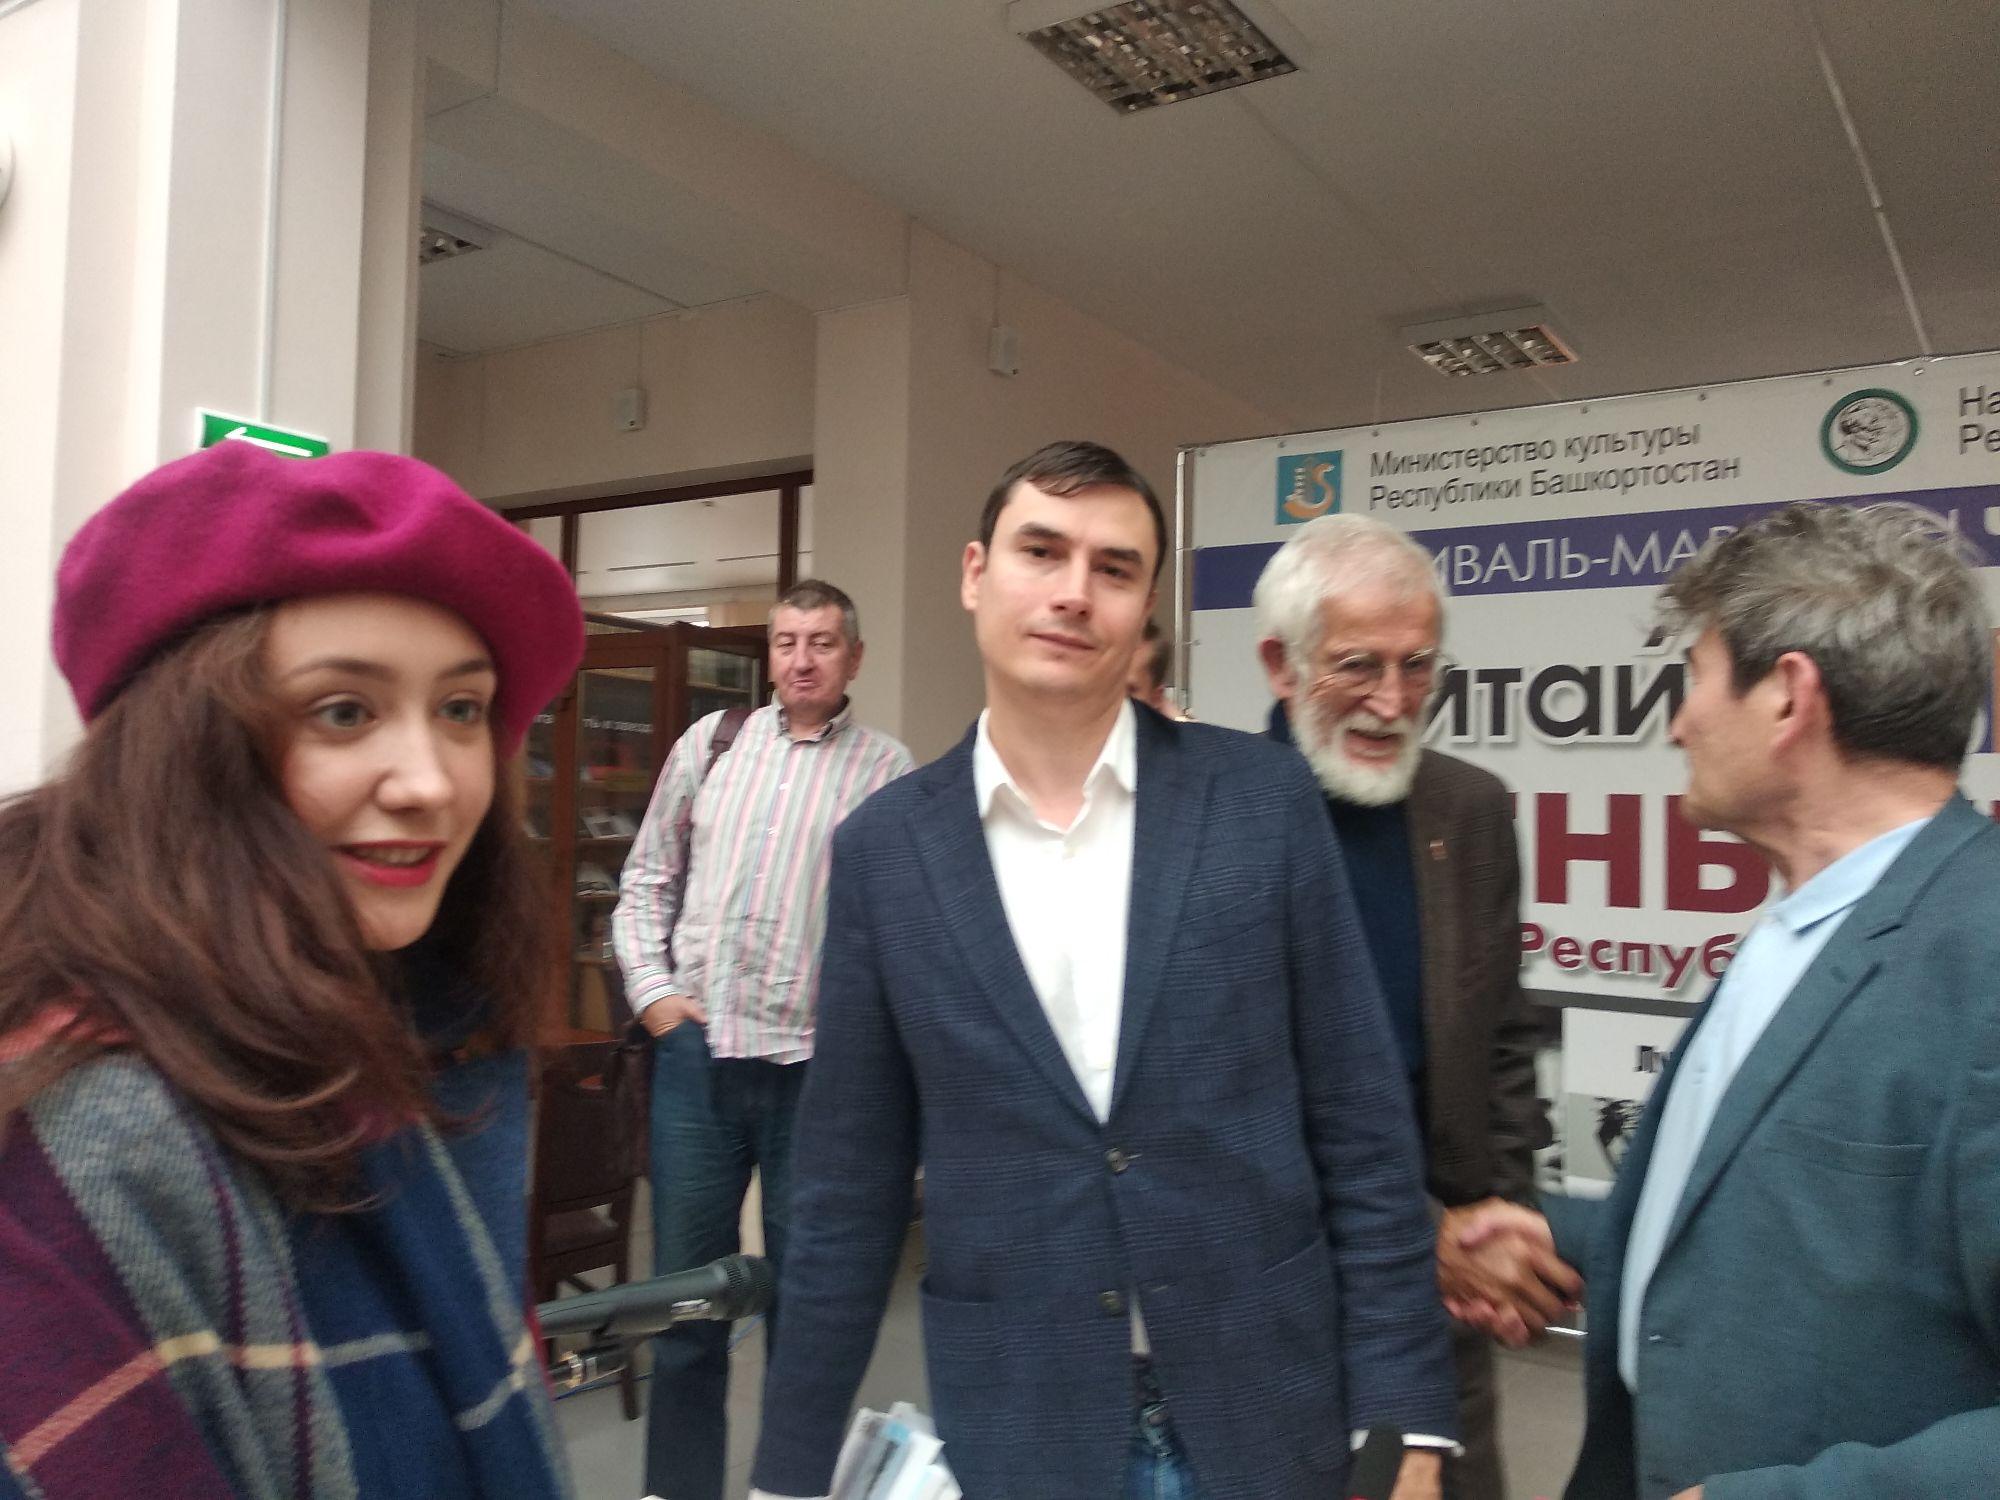 Кто там в малиновом берете? Это прозаик Розалия Вахитова .